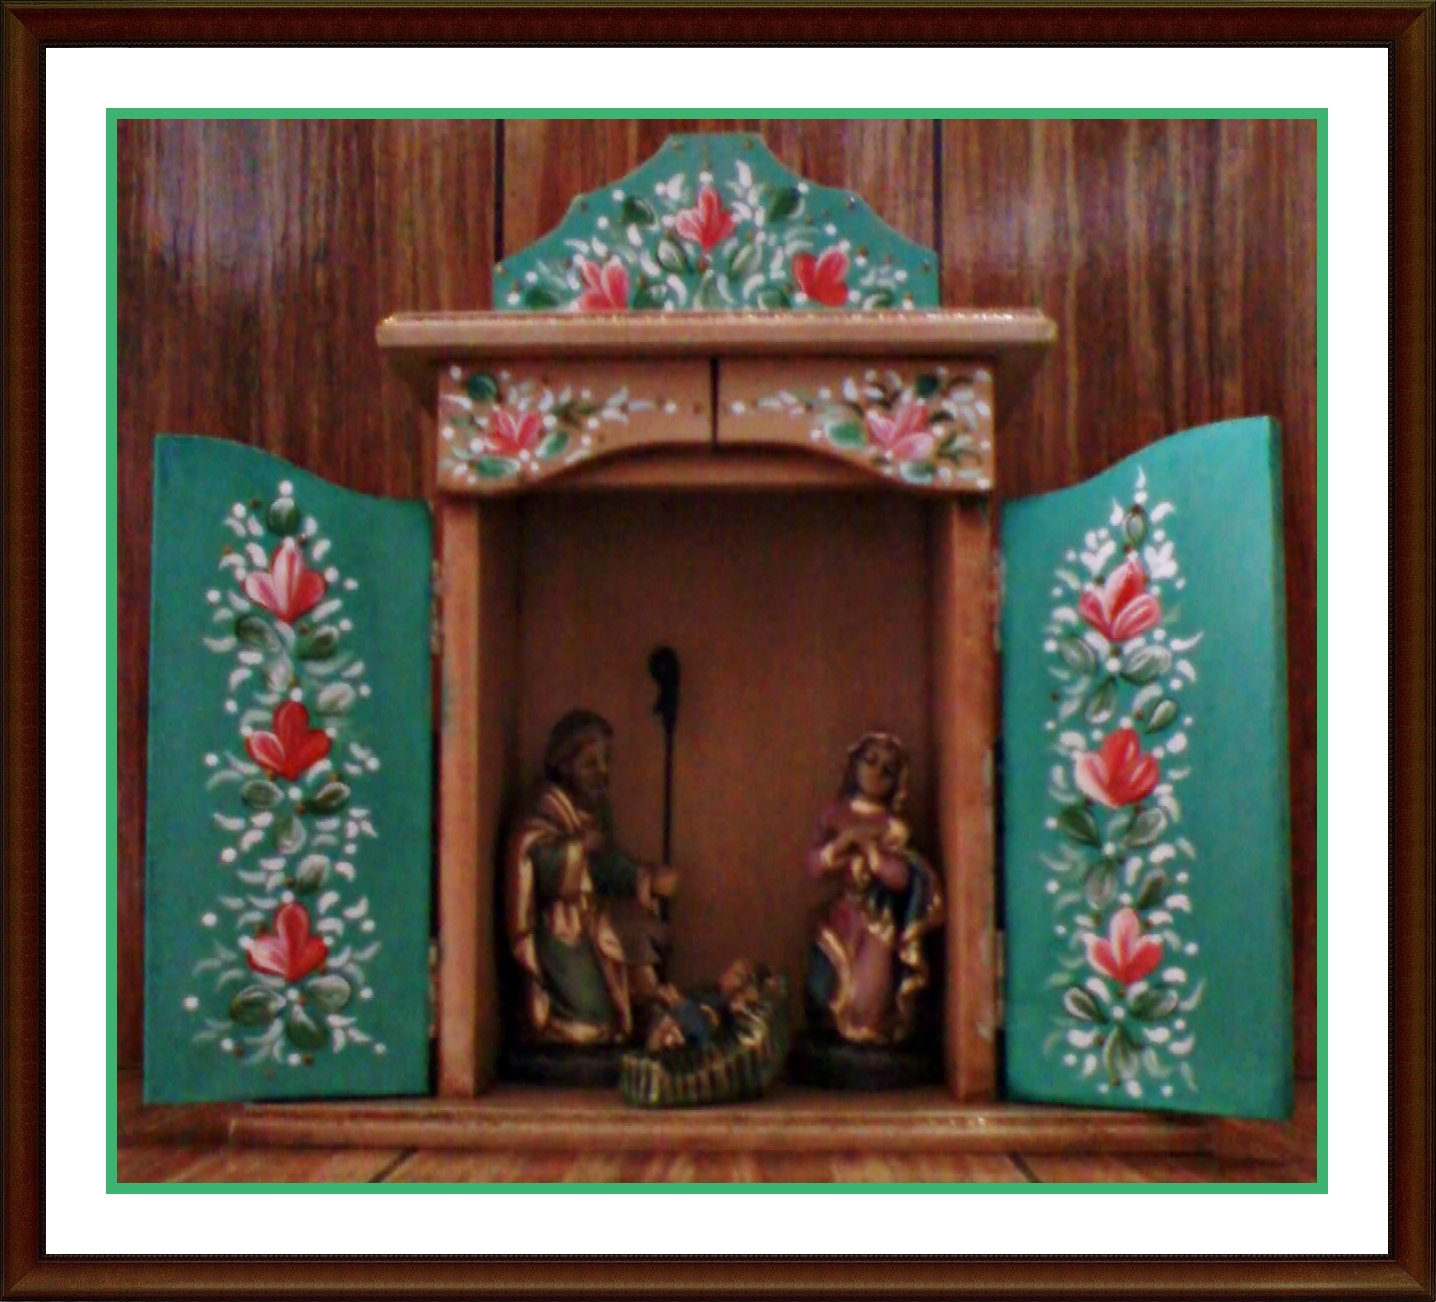 Restaura es e artesanatos por silvana capozzi sagrada - Estilo sagrada familia ...